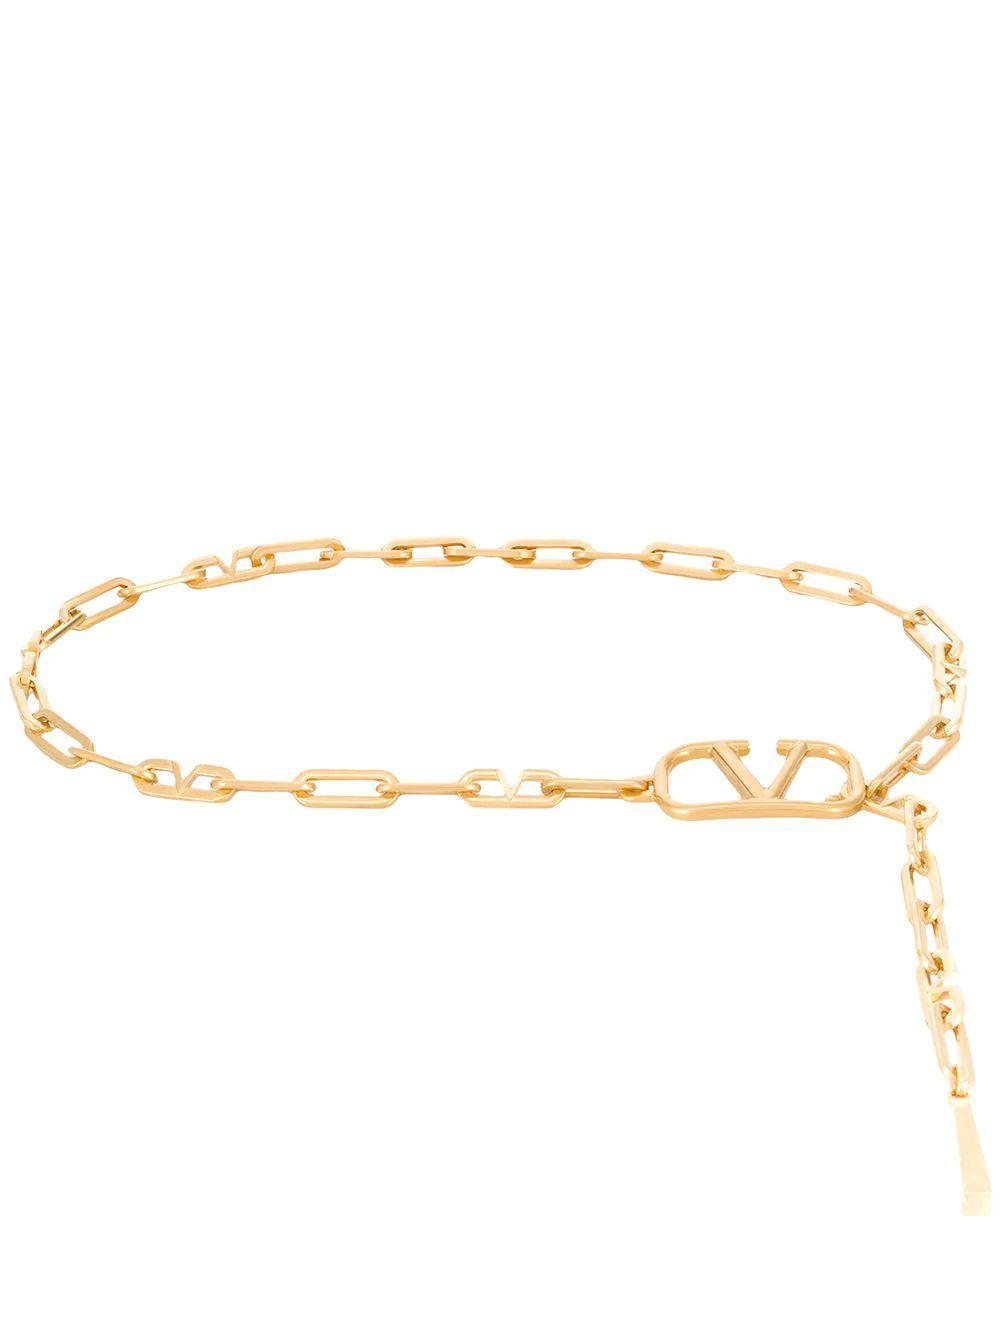 Vlogo Chain Belt Item # VW2T0S70LEI